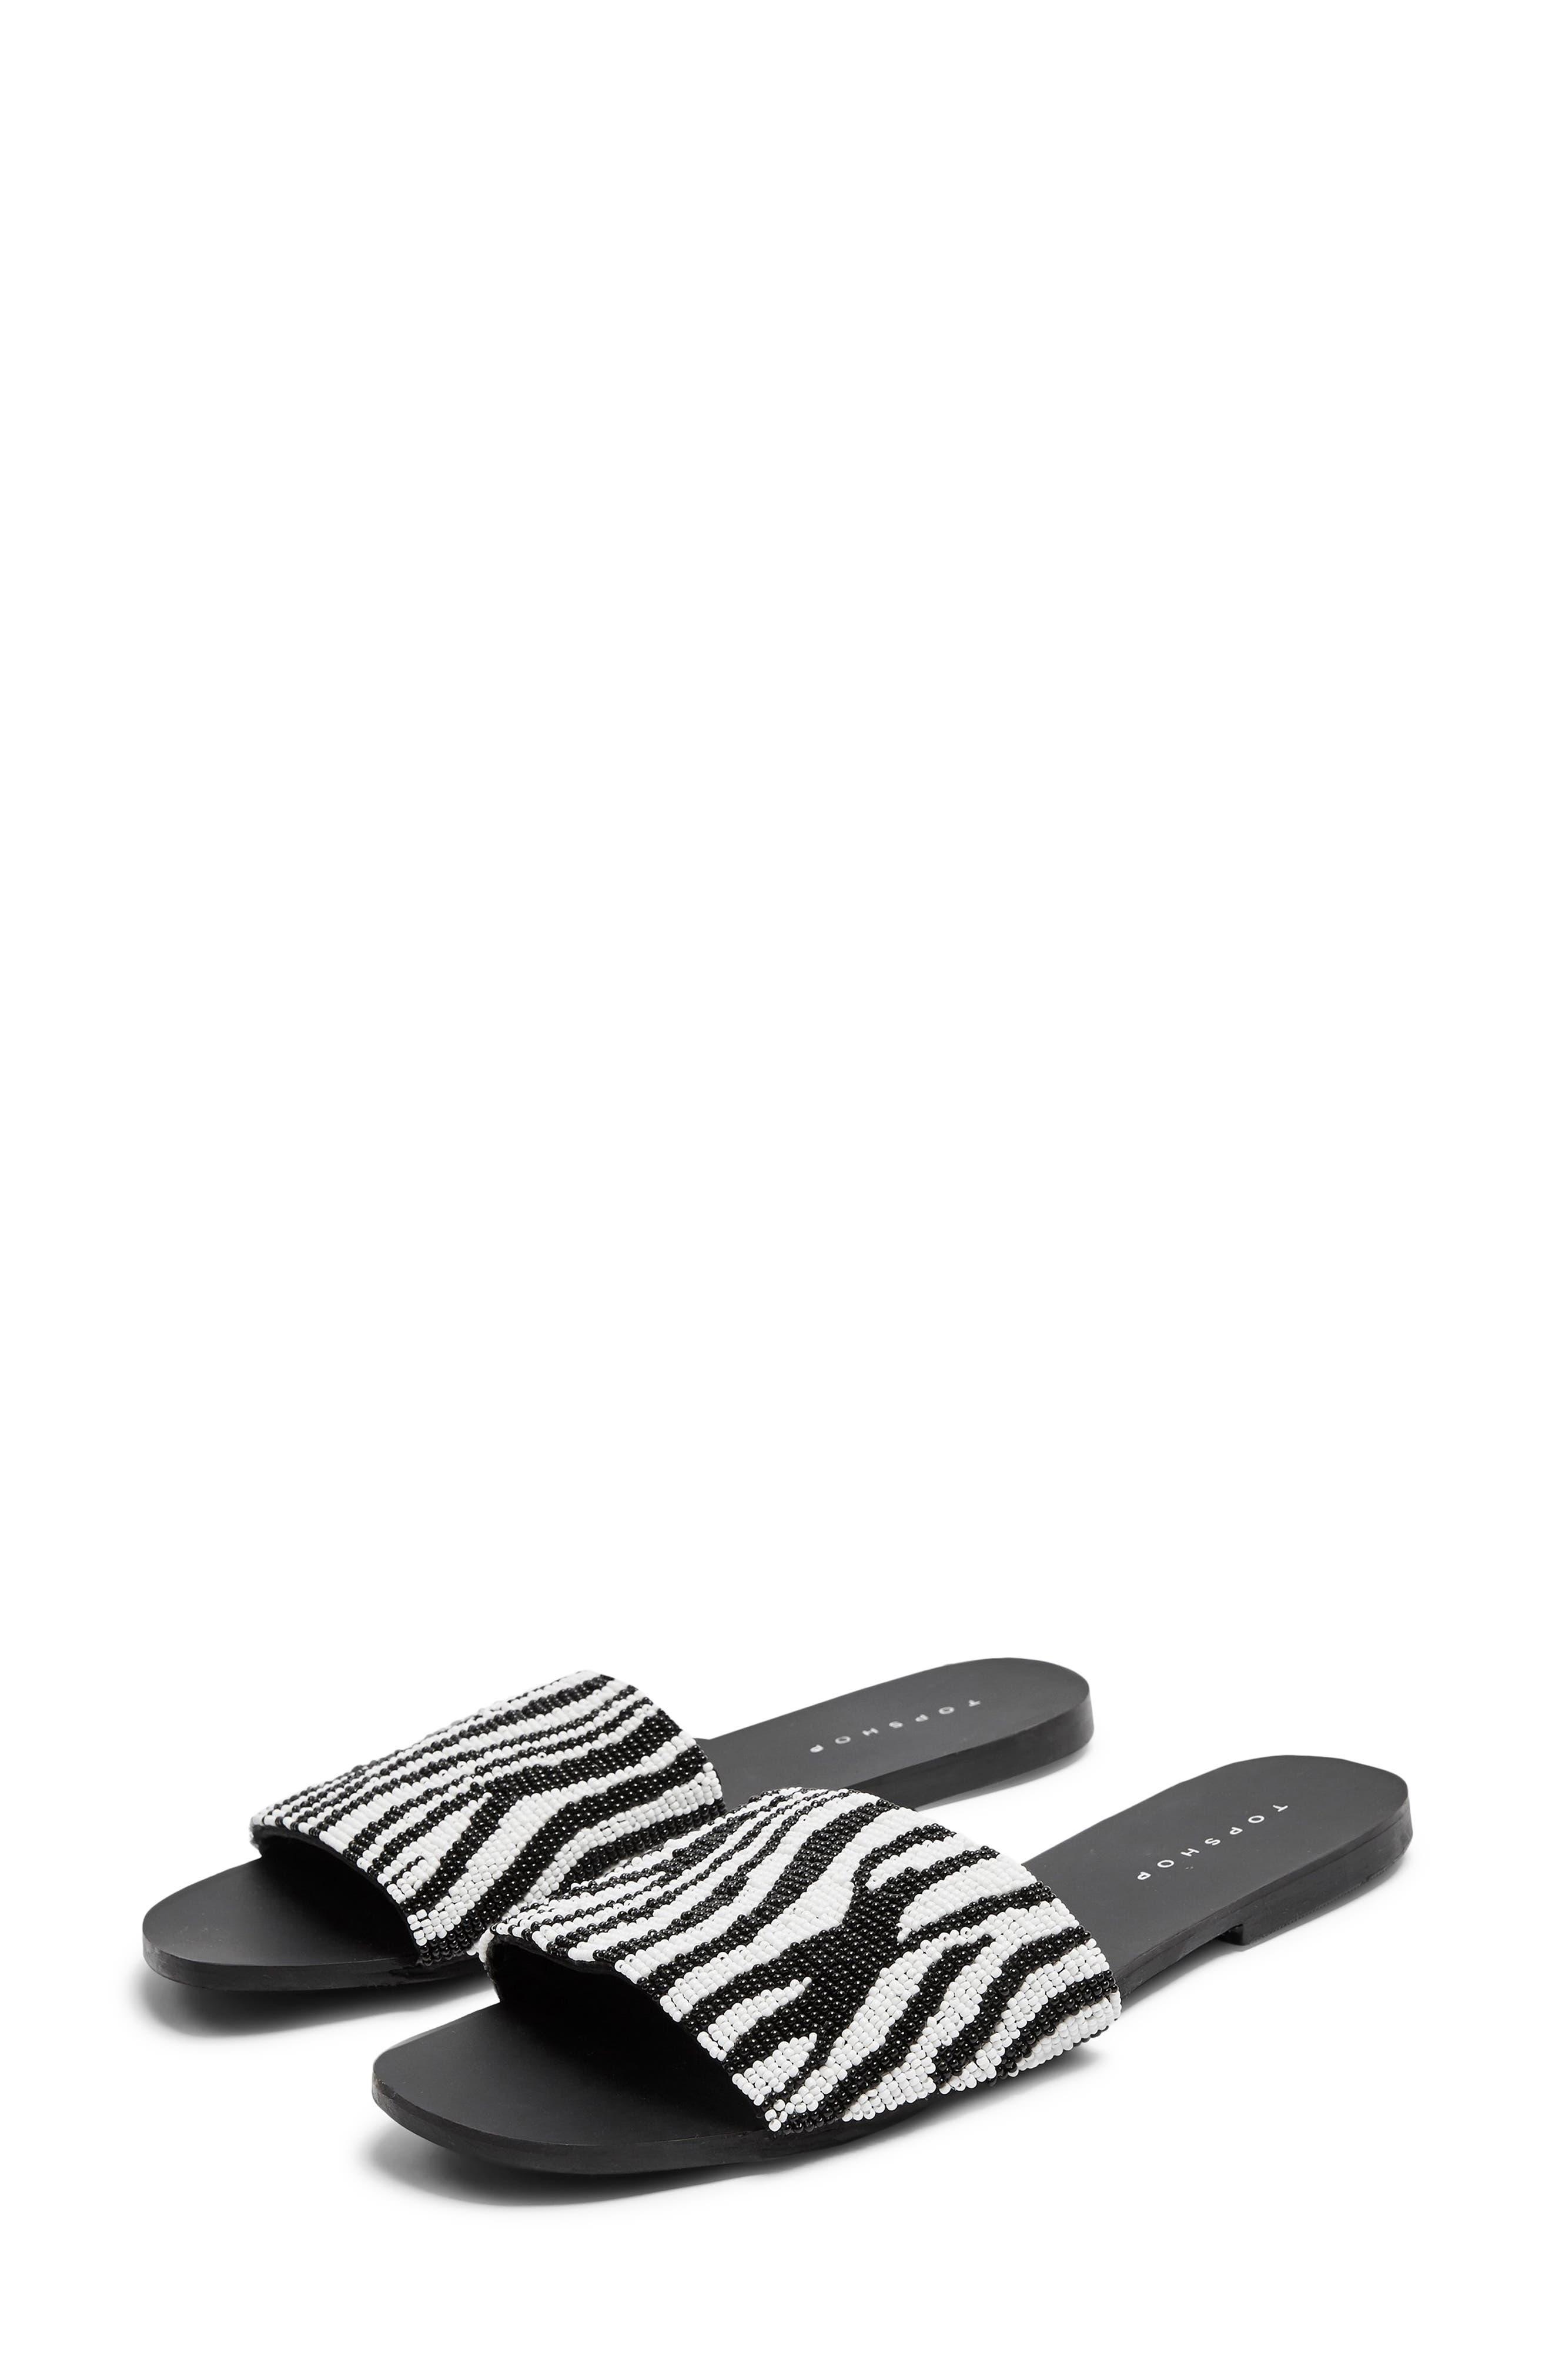 Topshop Beaded Zebra Stripe Slide Sandals - Black